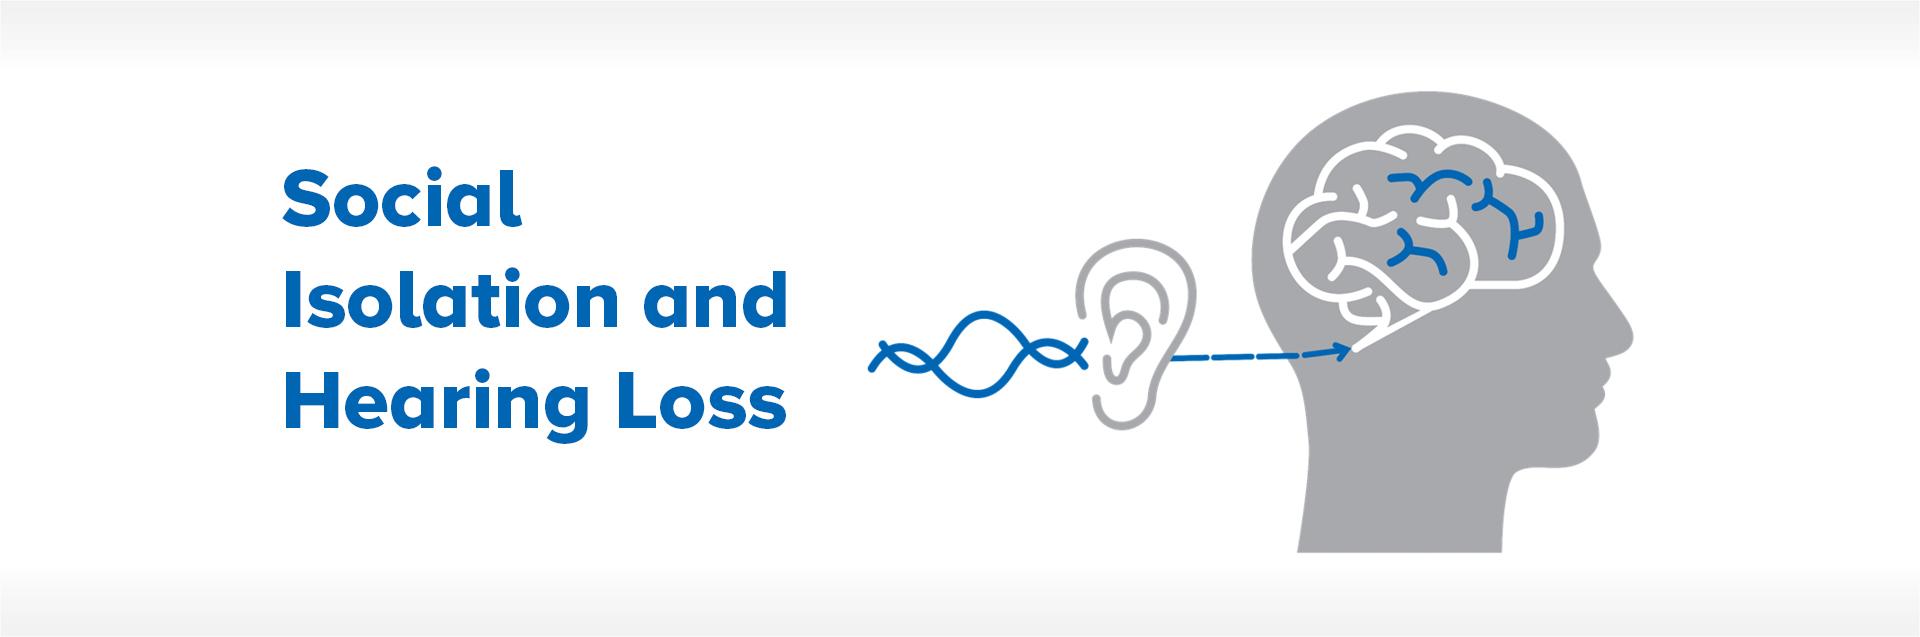 Social Isolation and Hearing Loss